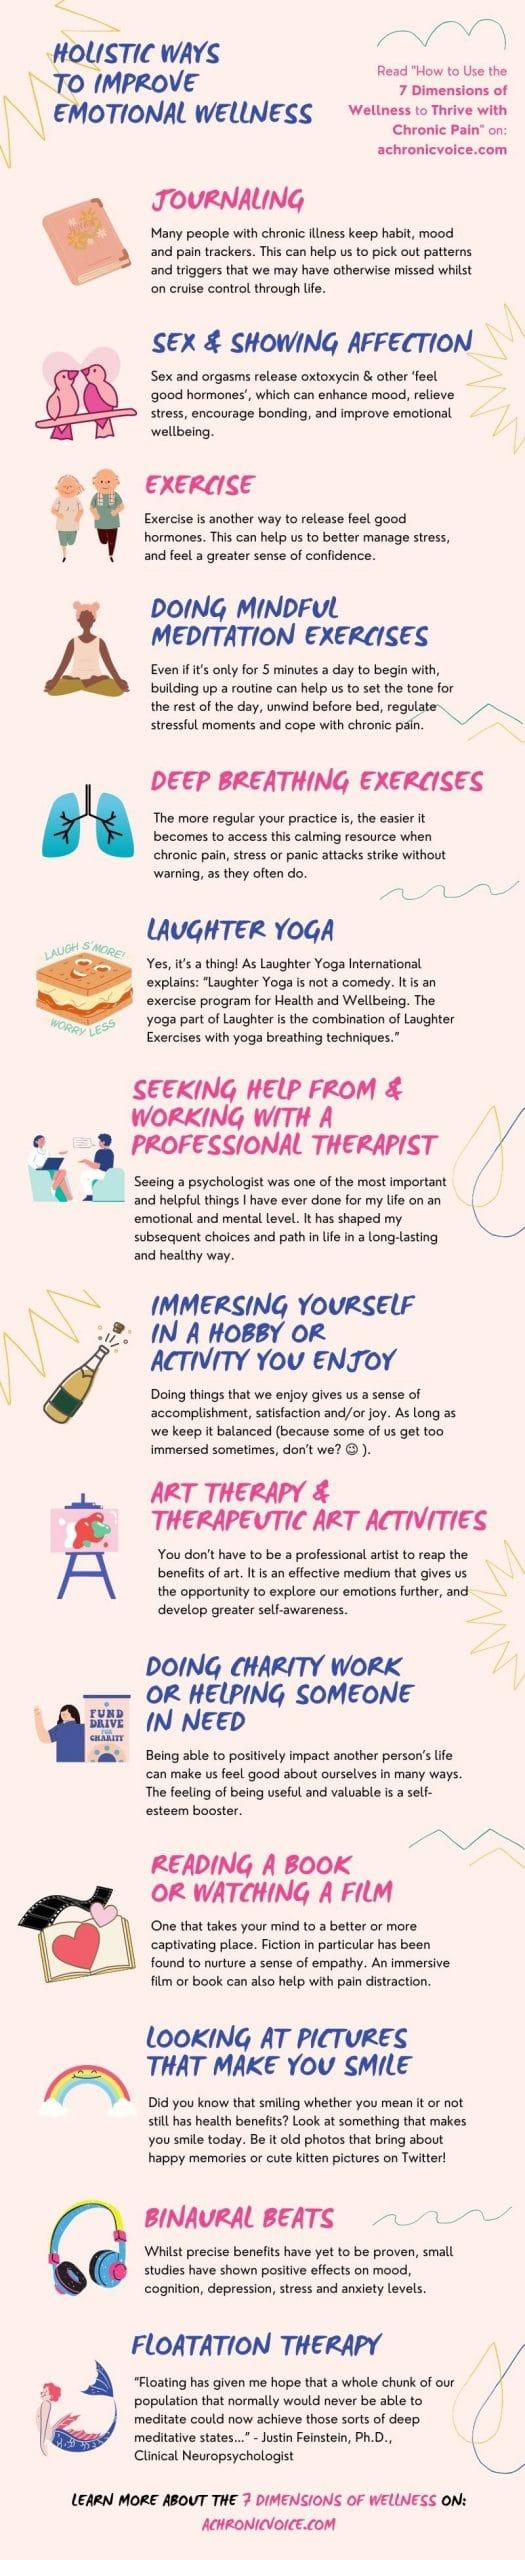 Holistic Ways to Improve Emotional Wellness Infographic